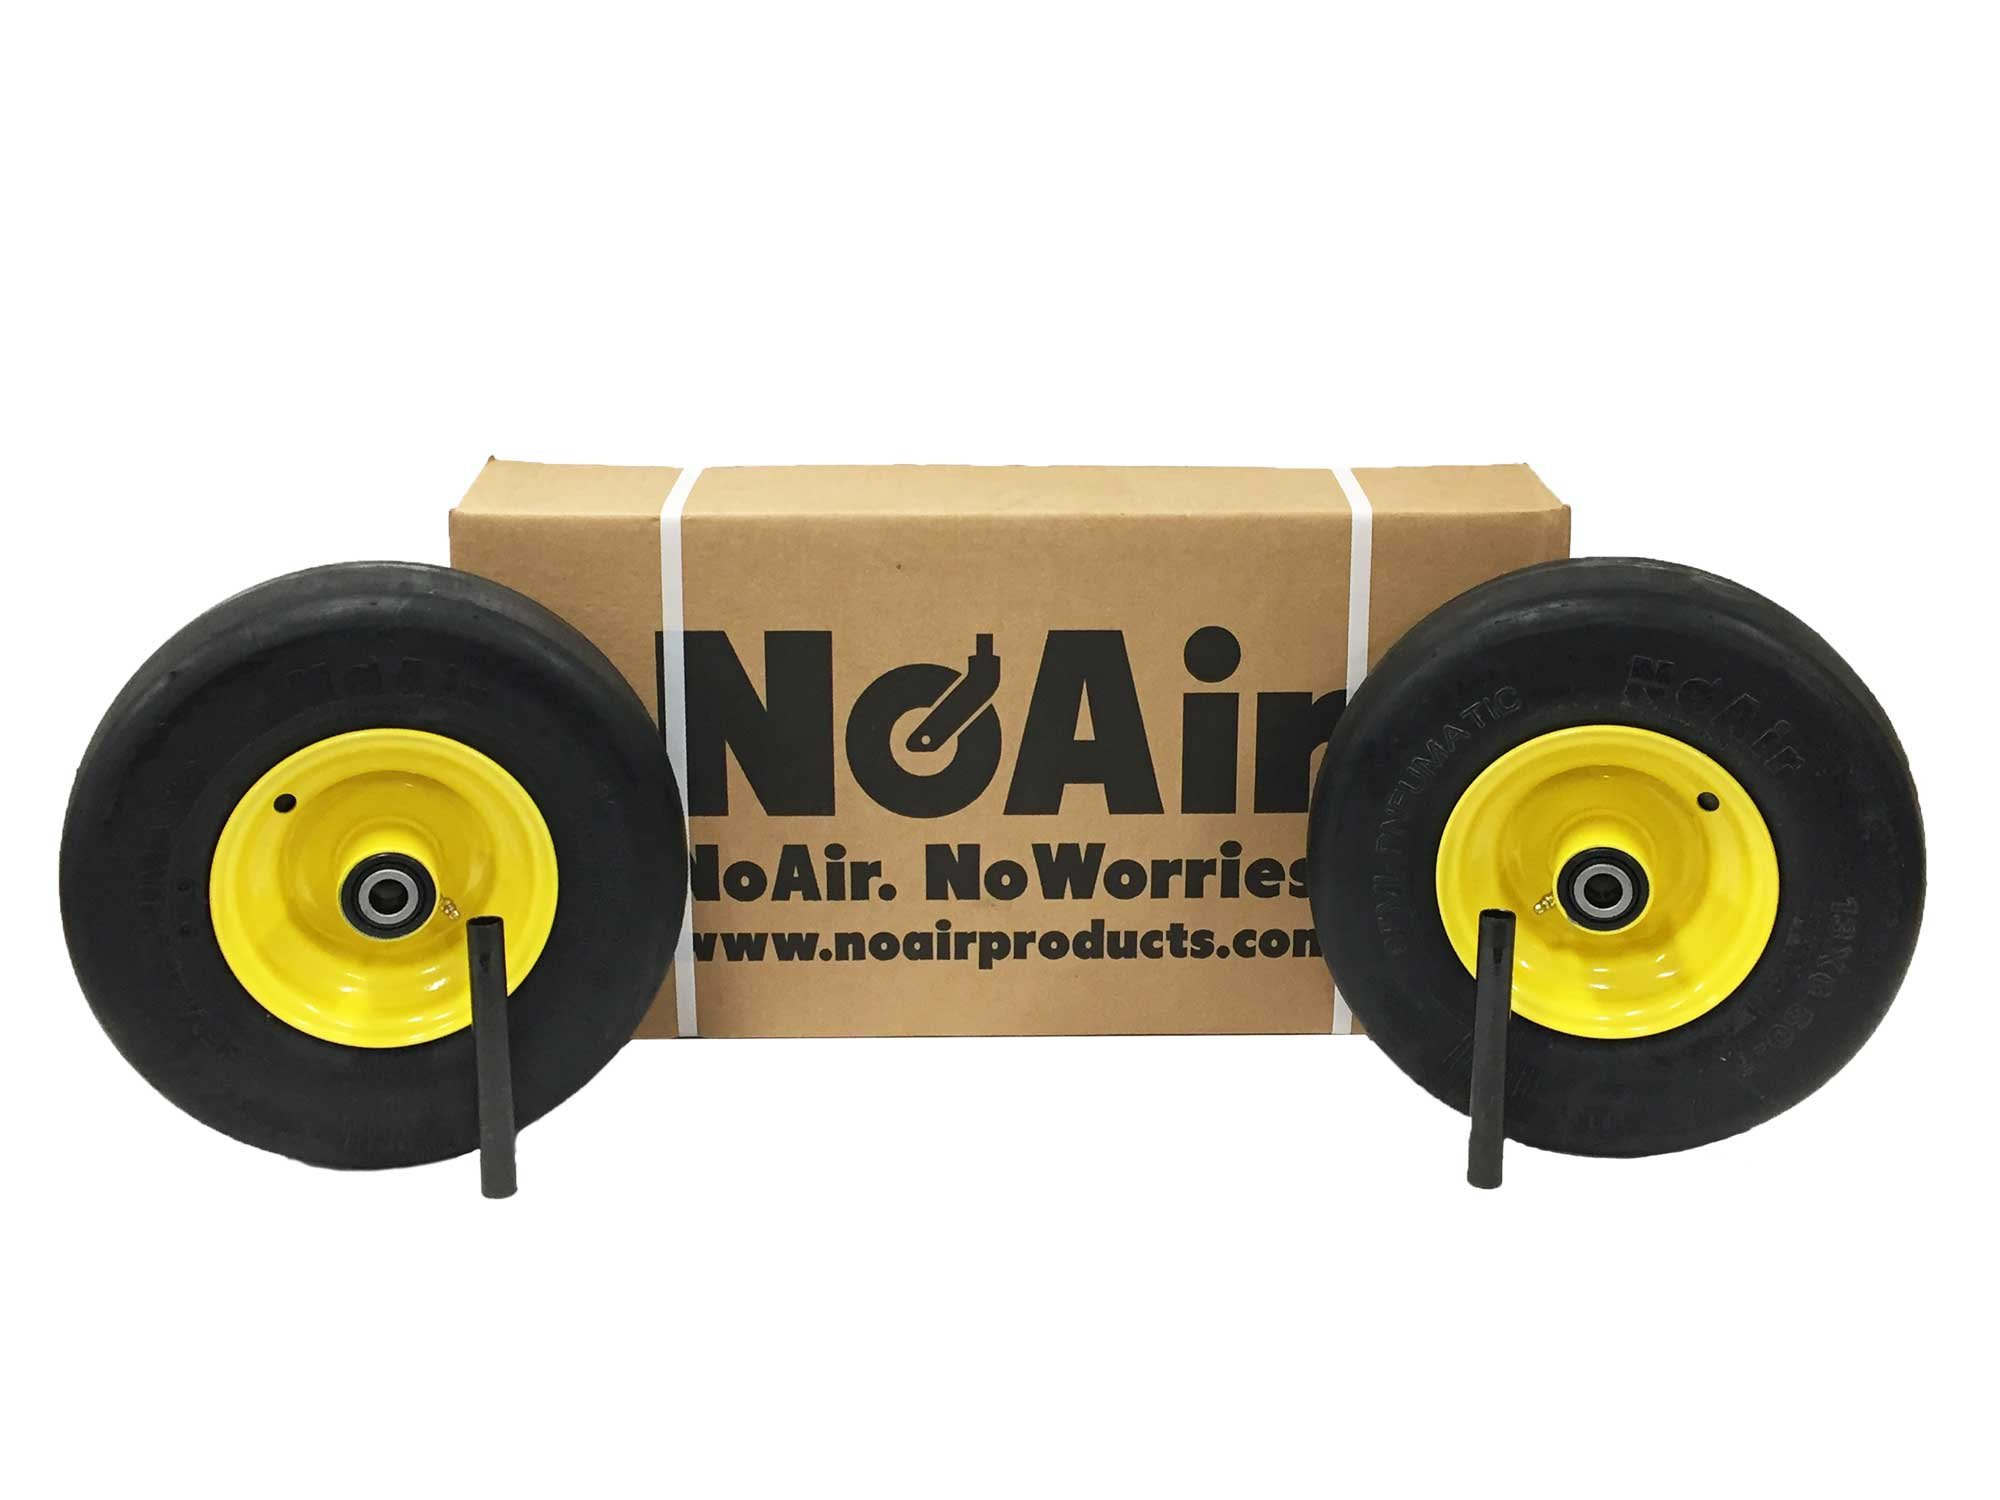 John Deere Flat Free Tire Assemblies 13x6.50-6 Yellow TCA19309 TCA16946 by NoAir (Image #1)